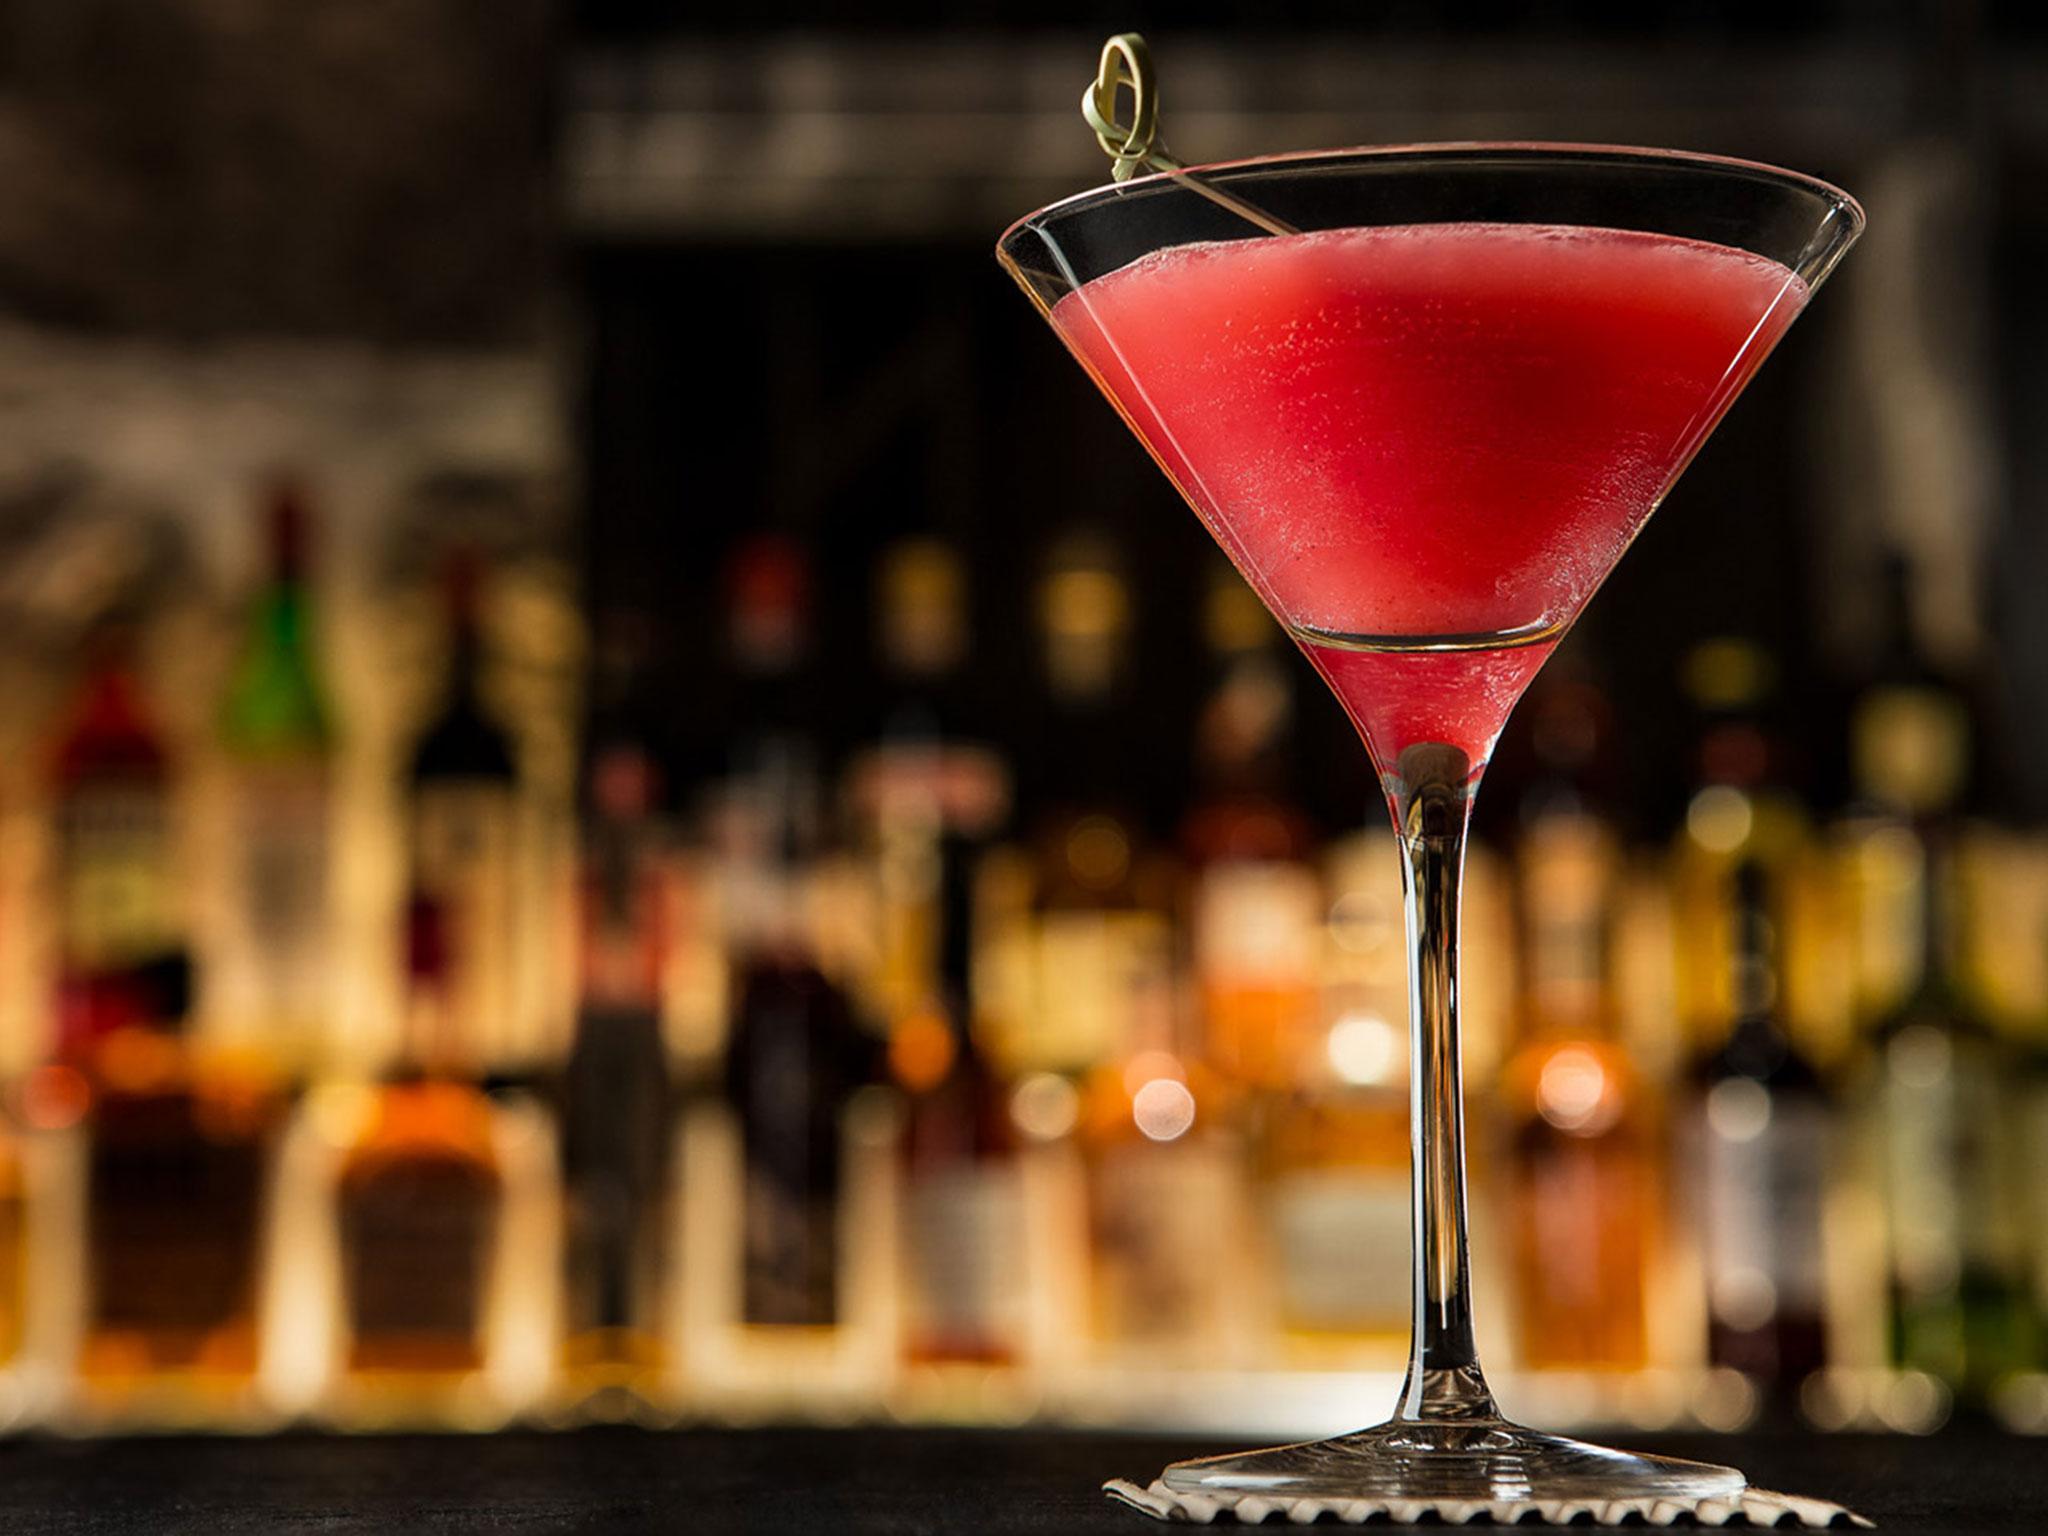 Cocktails Served at the 1520 Bar